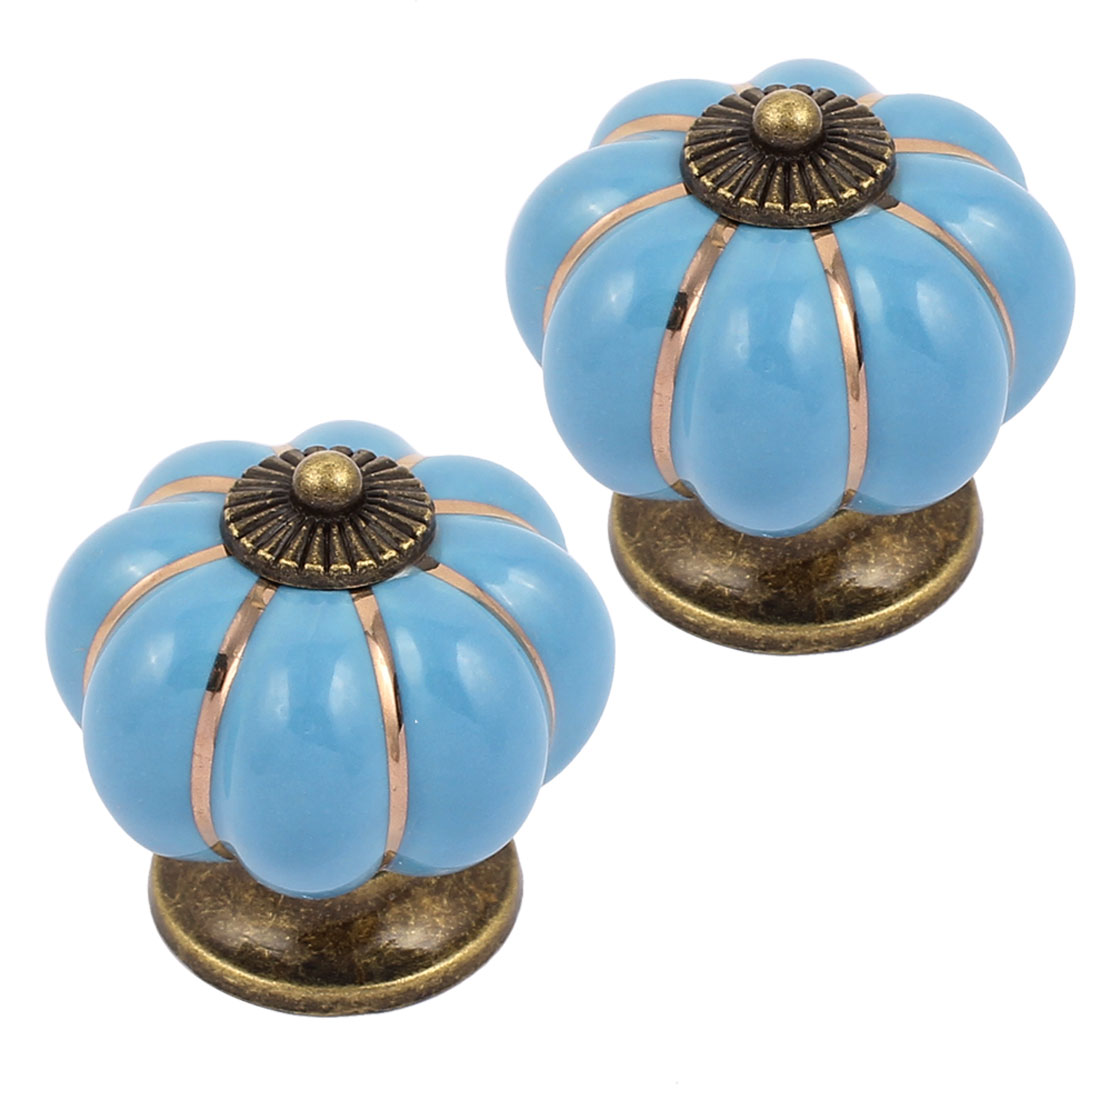 Cabinet Wardrobe Drawer Door Pull Pumpkin Ceramic Knobs Handle Blue 2pcs